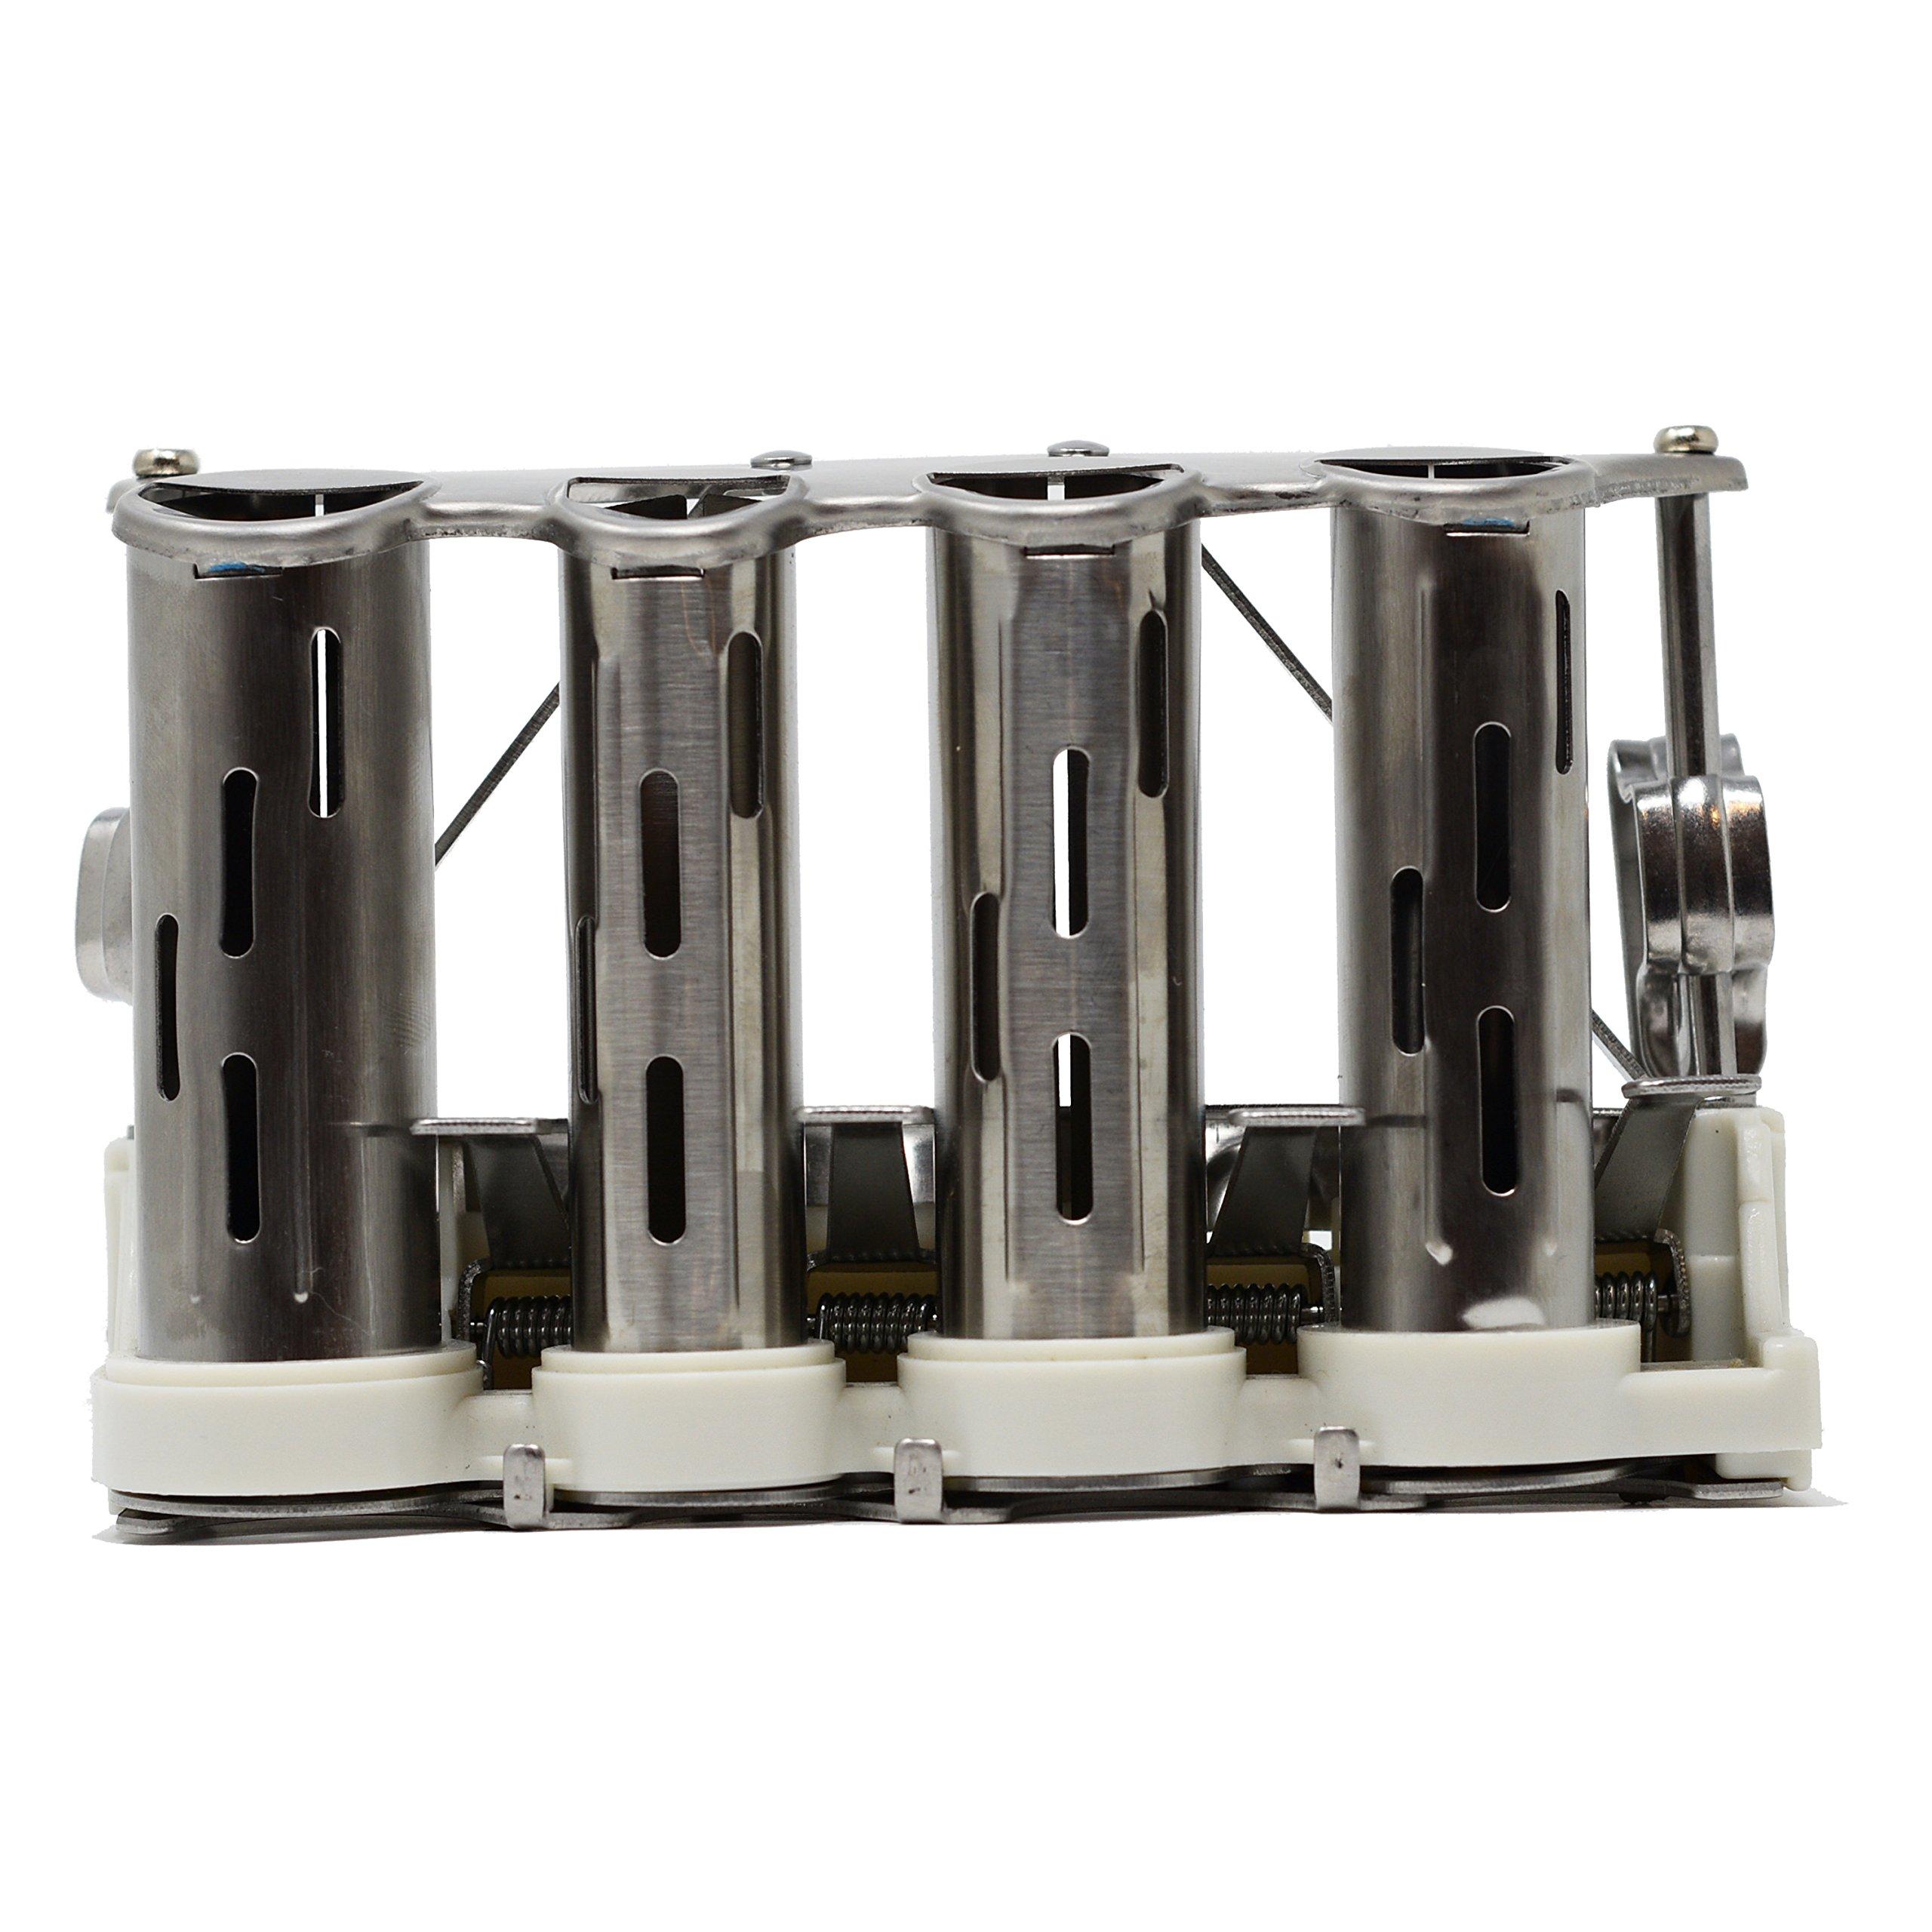 Nadex 4 Barrel Steel Coin Dispenser Money Changer with Belt Clips